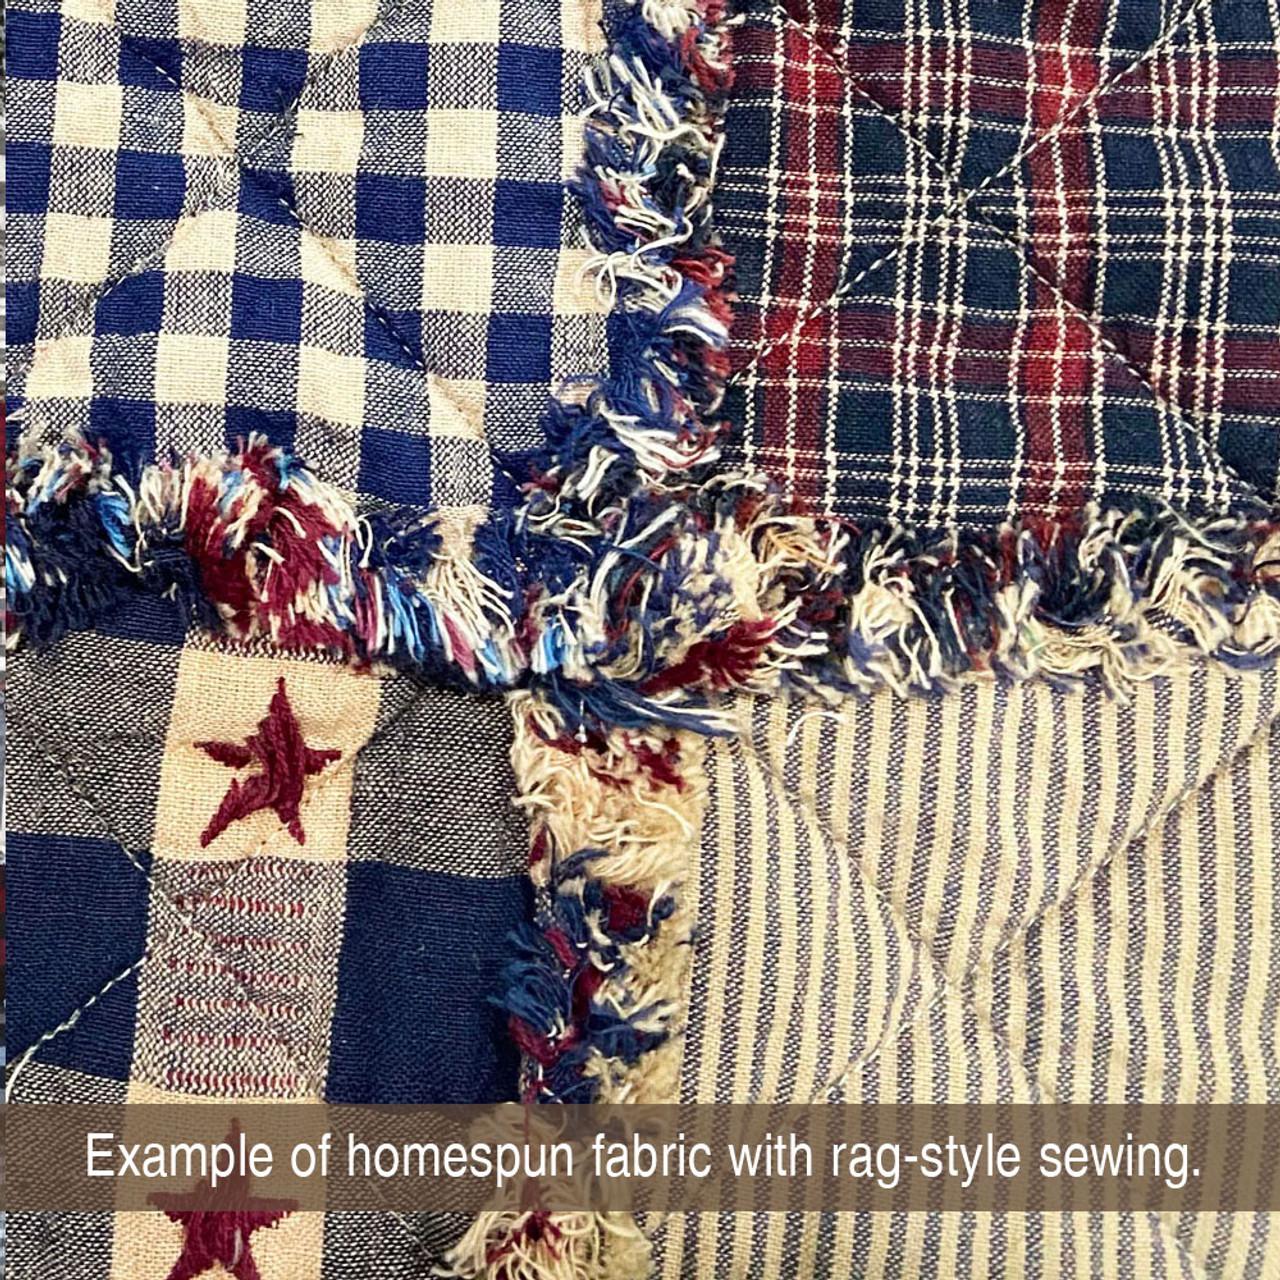 Heritage Navy Blue Thin Stripe Homespun Cotton Fabric